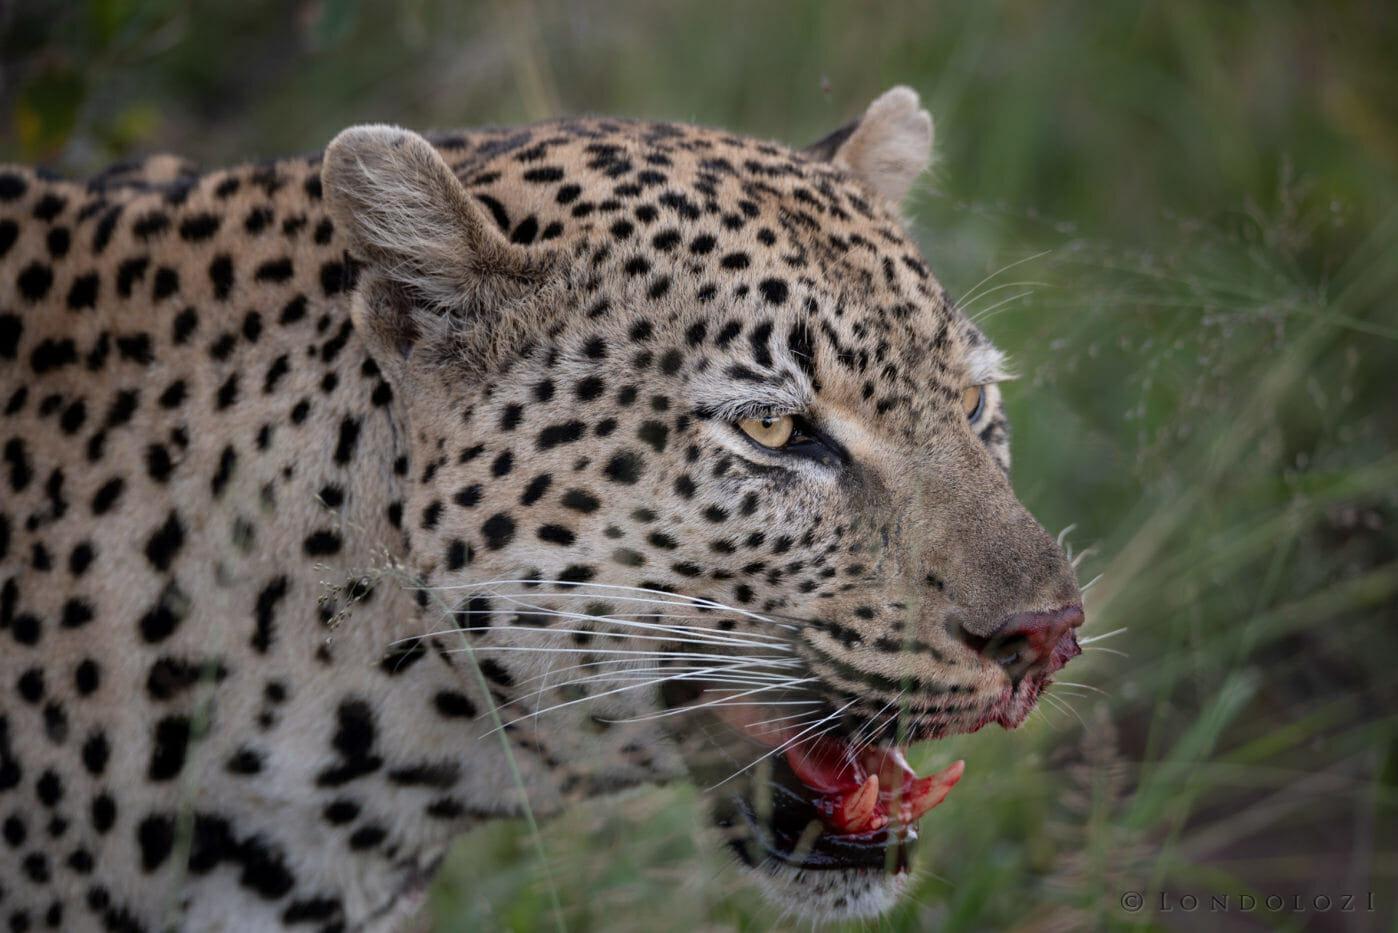 Flat Rock leopard Brock Cartlidge